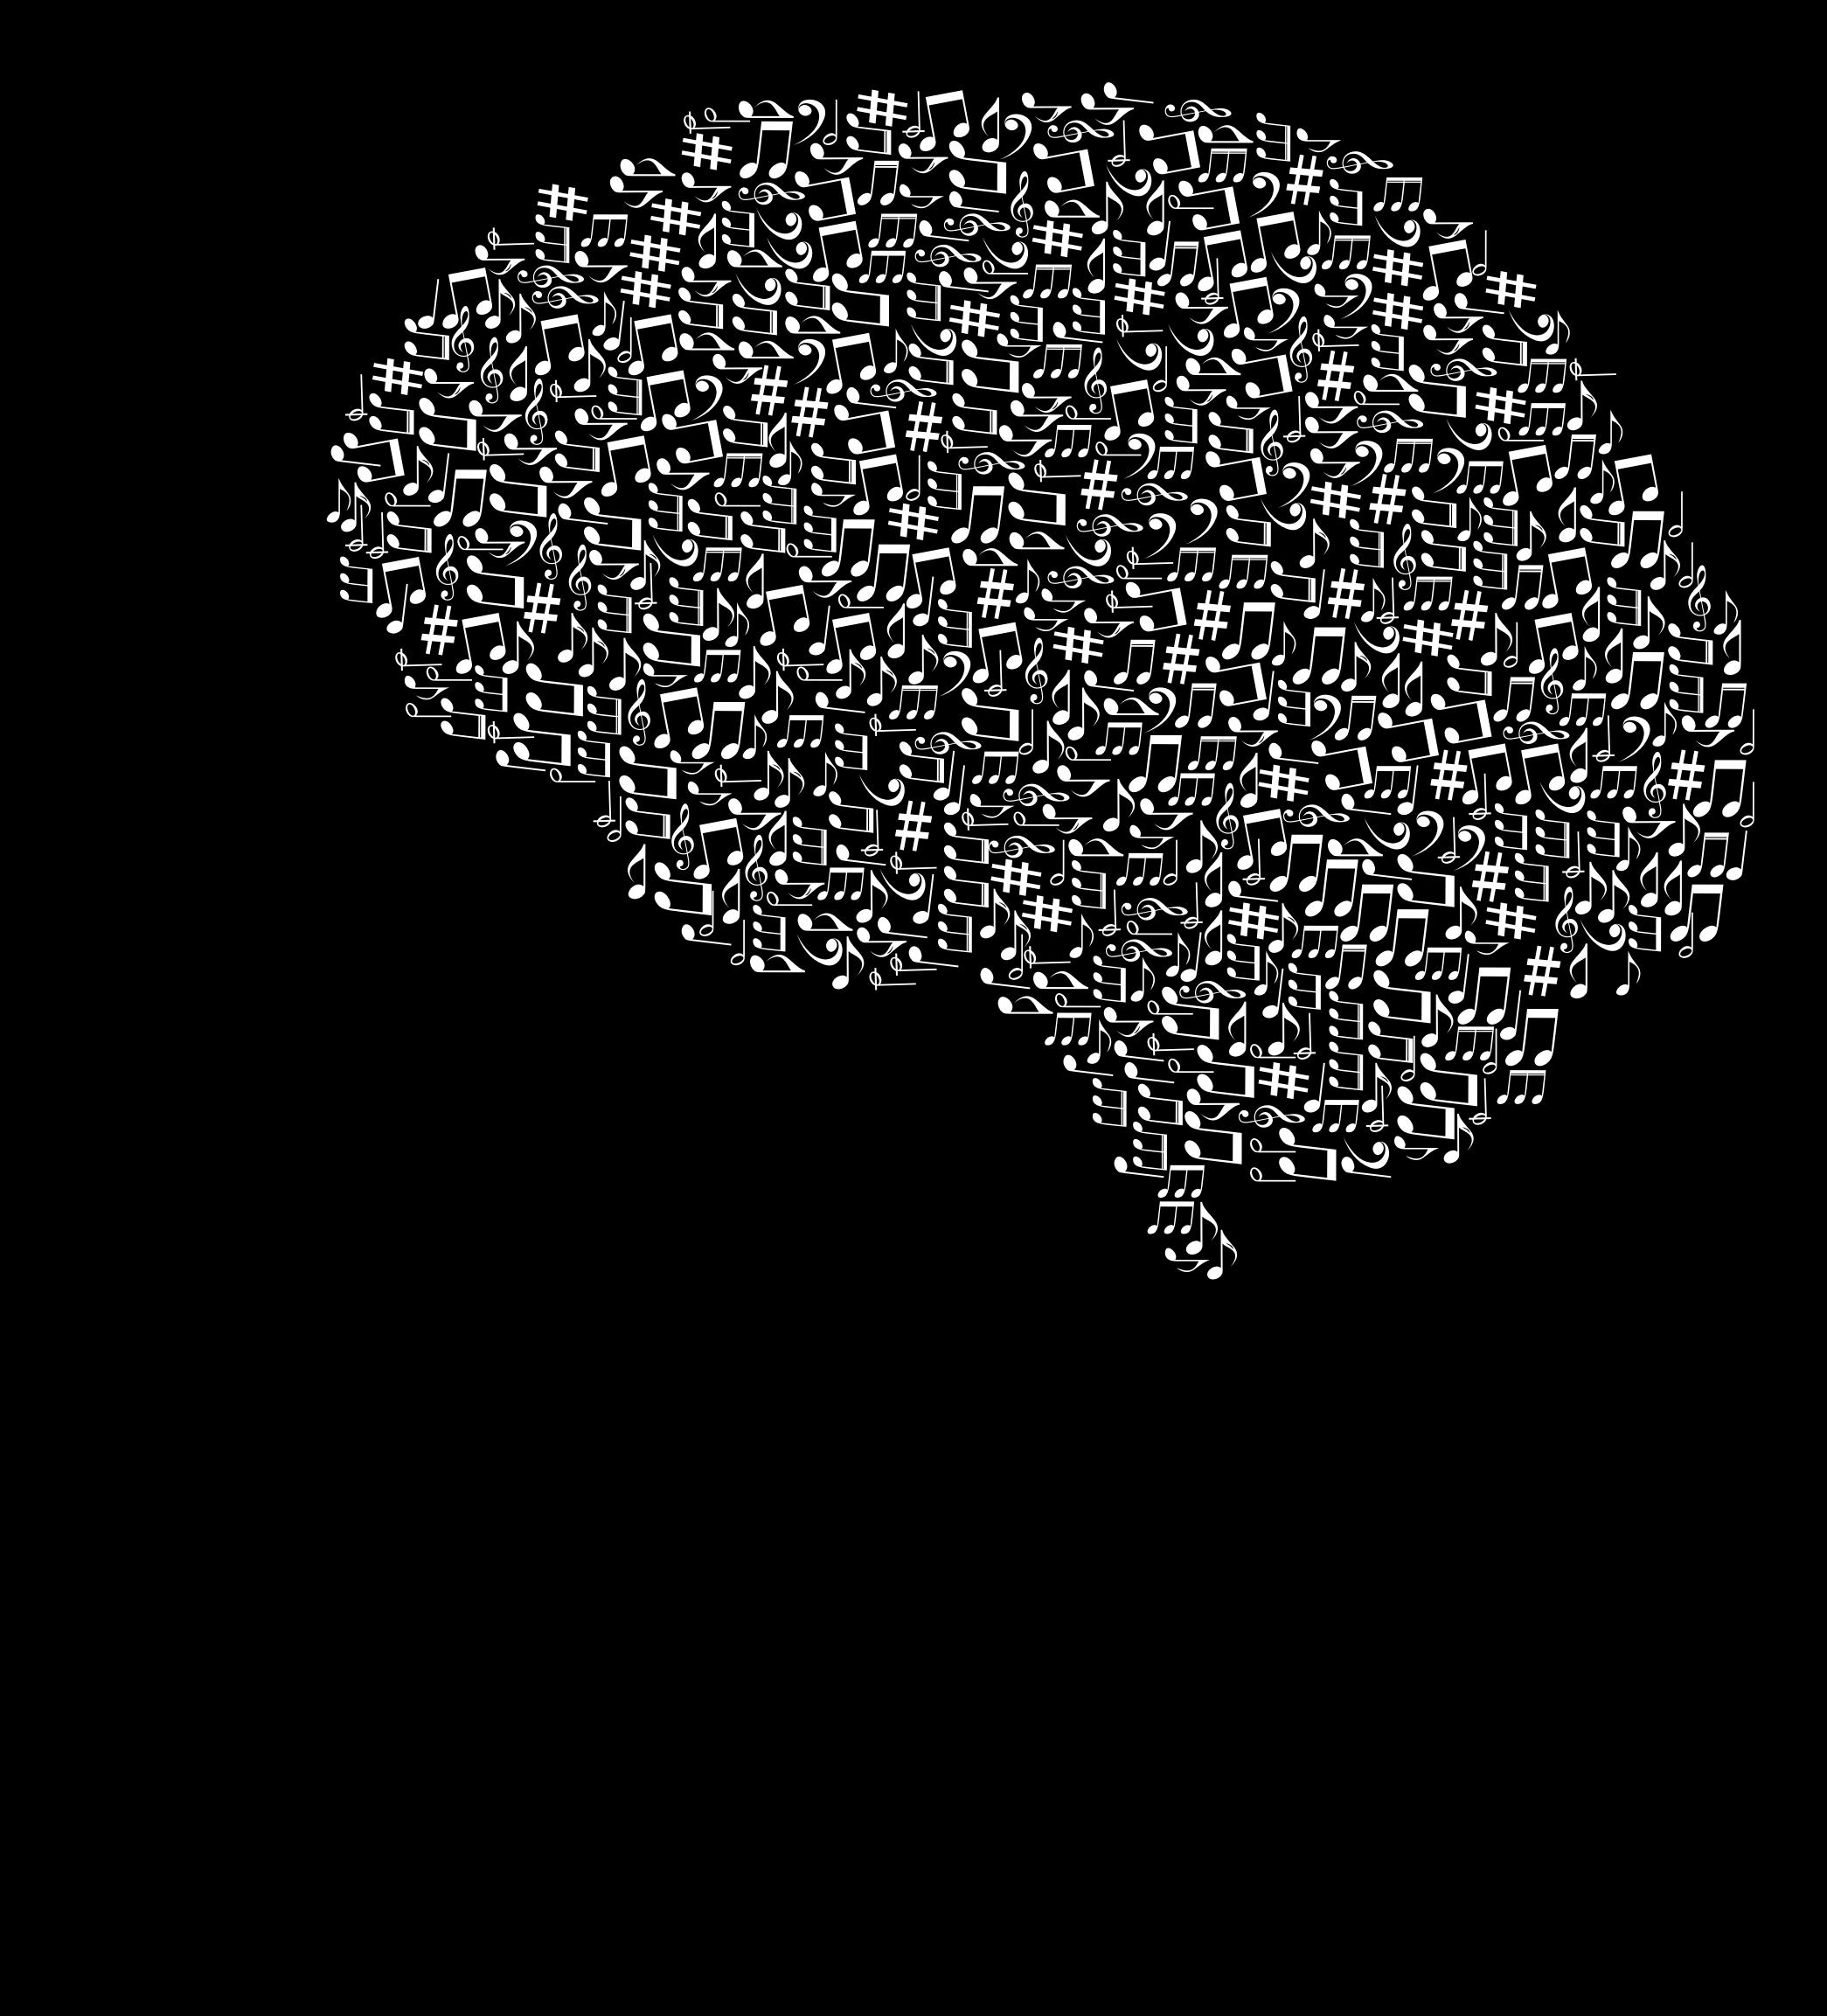 Music clipart silhouette. Head white big image